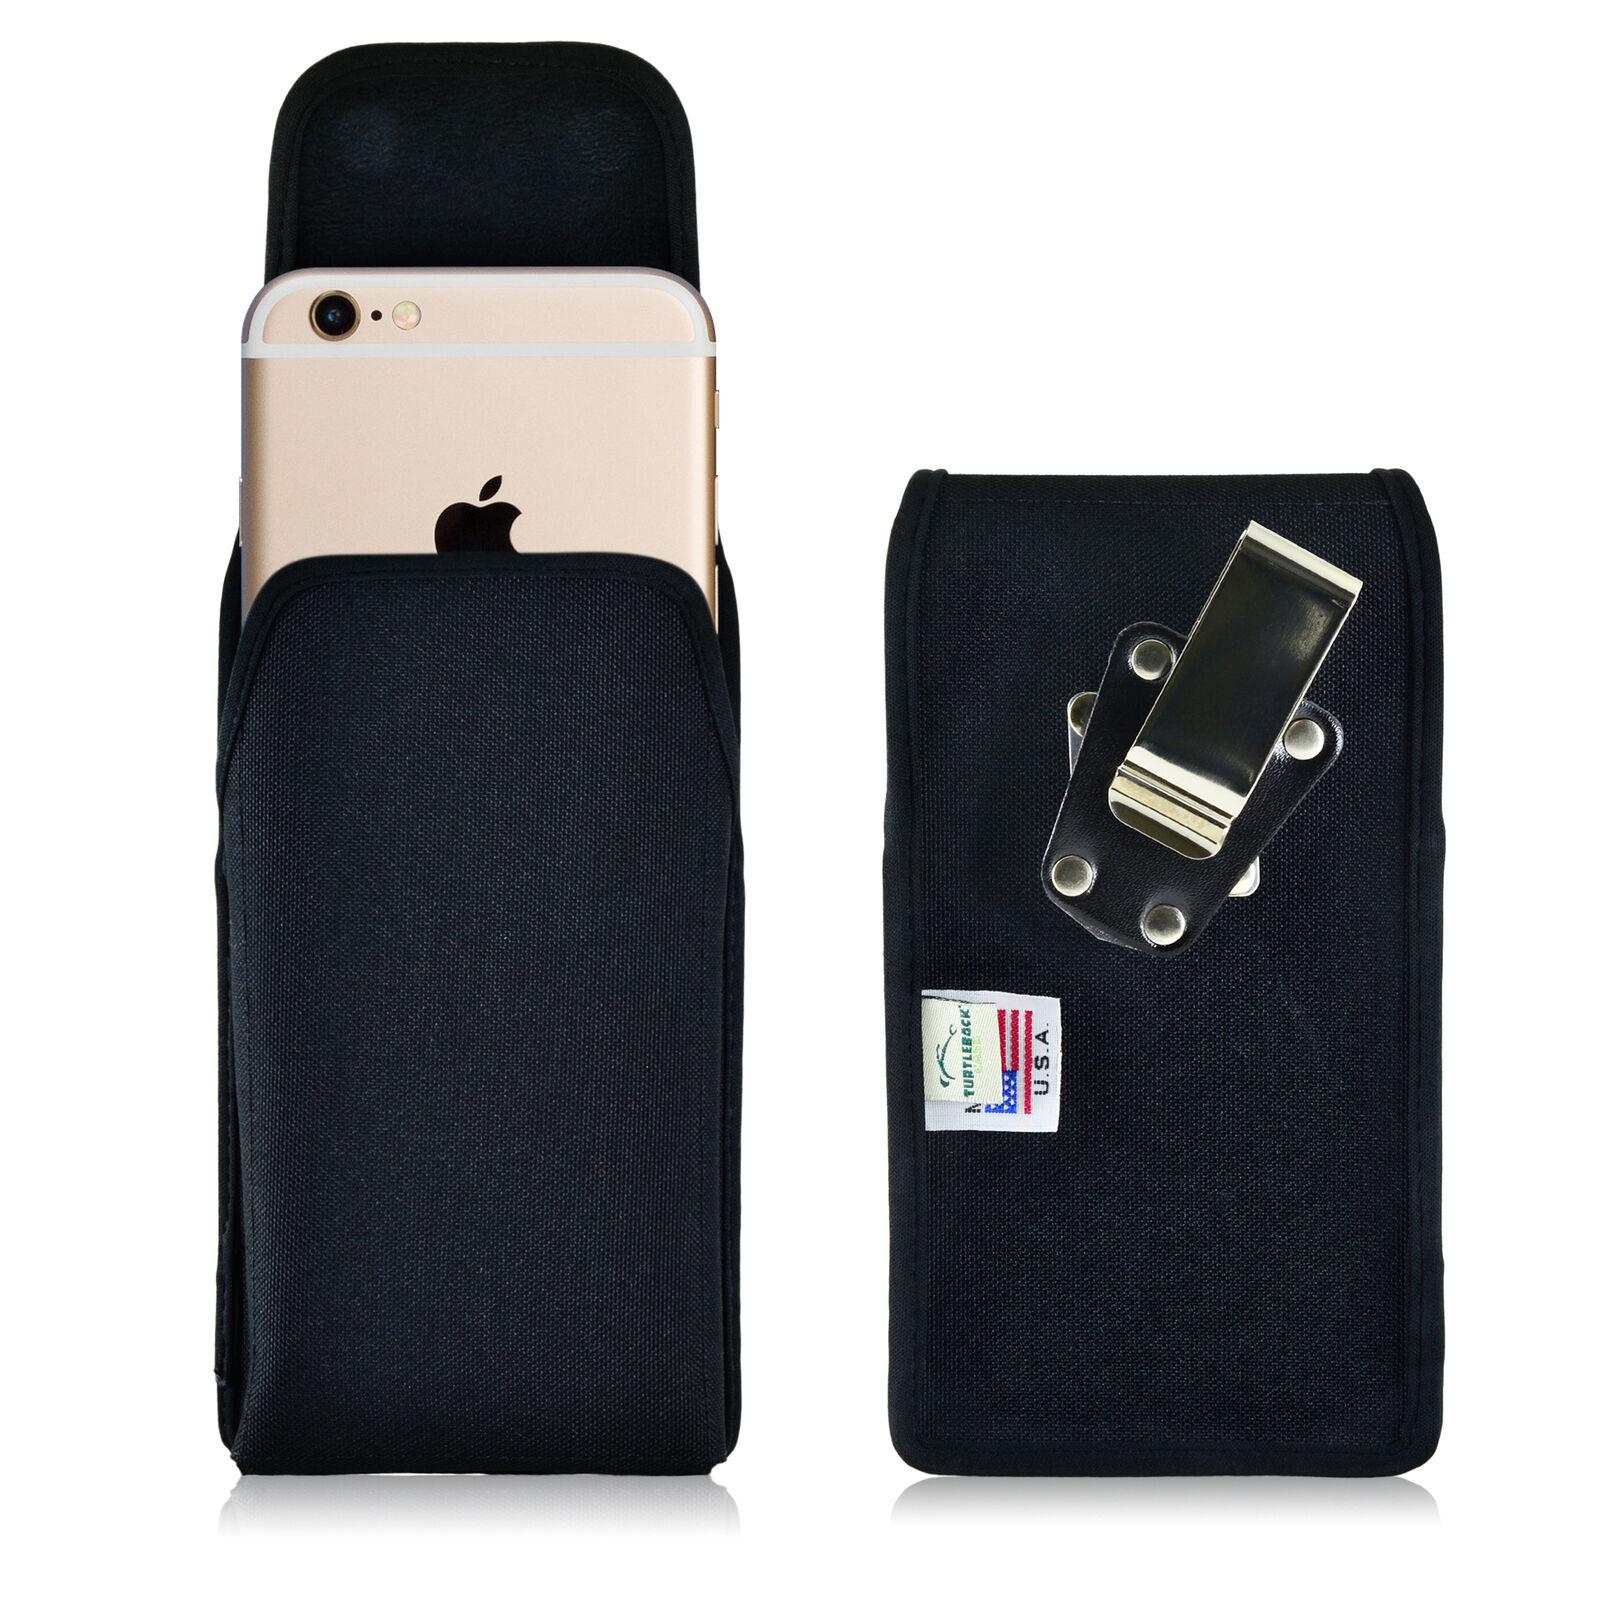 turtleback-apple-iphone-6s-nylon-vertical-black-holster-phone-case-metal-clip